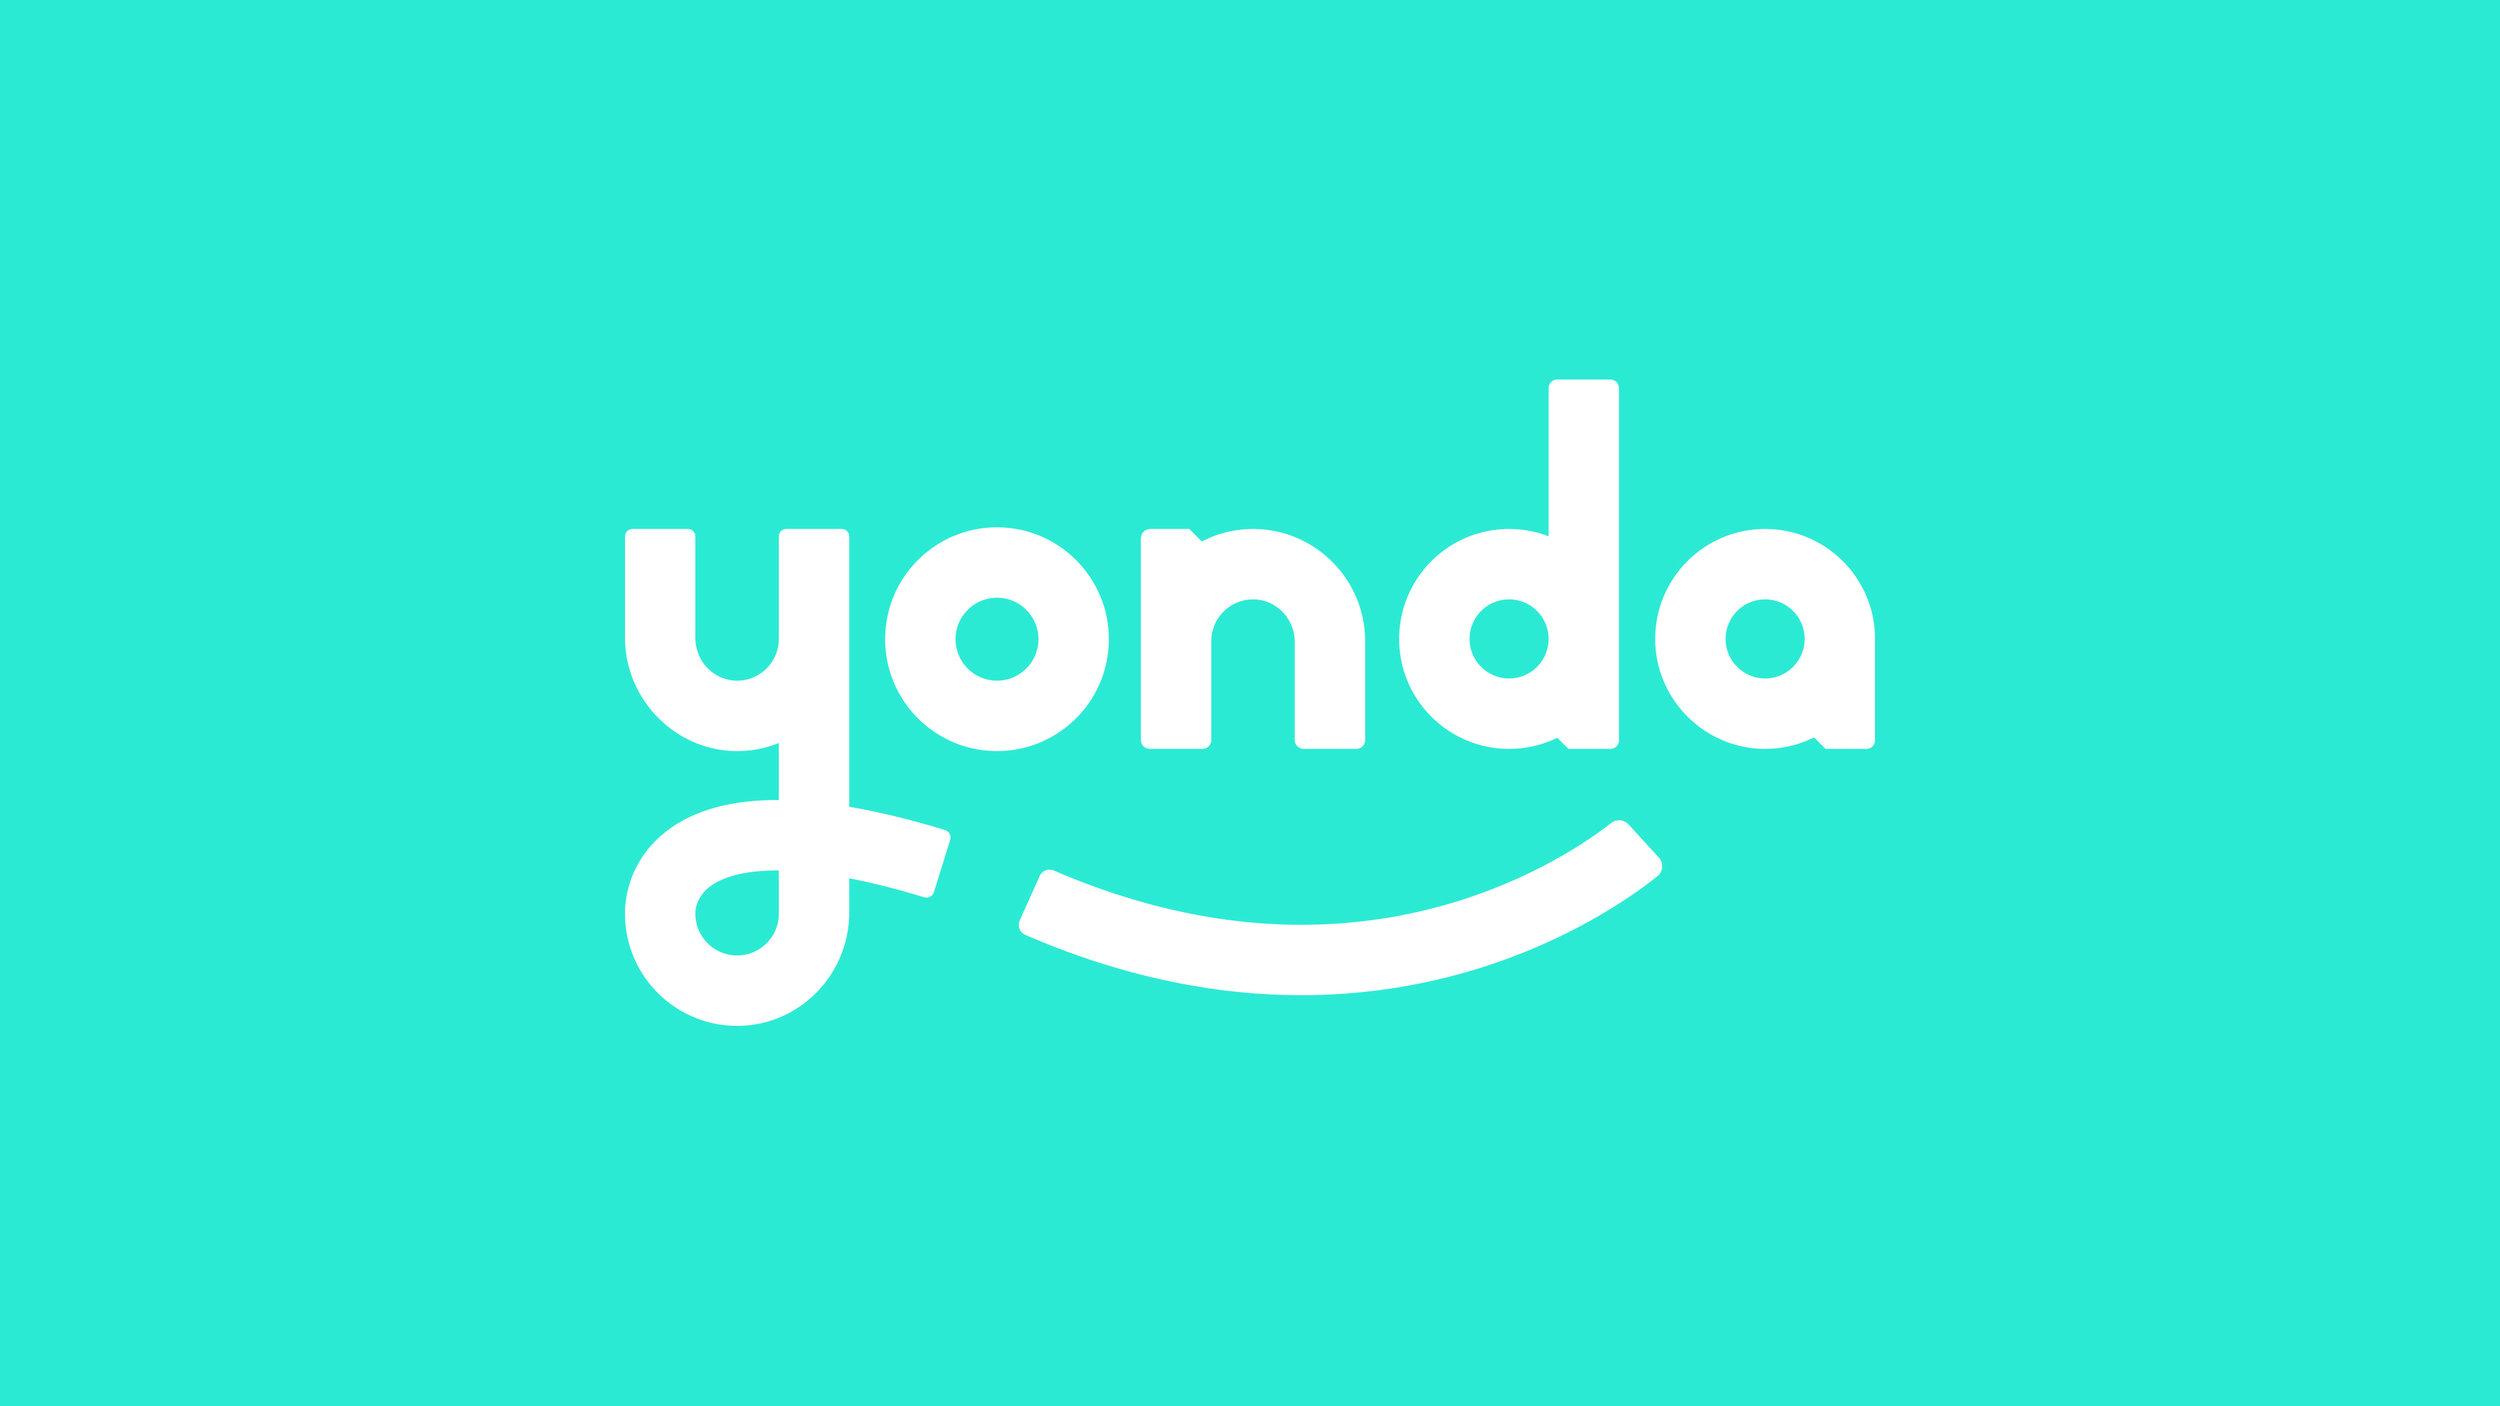 yonda_case_study_logo.jpg